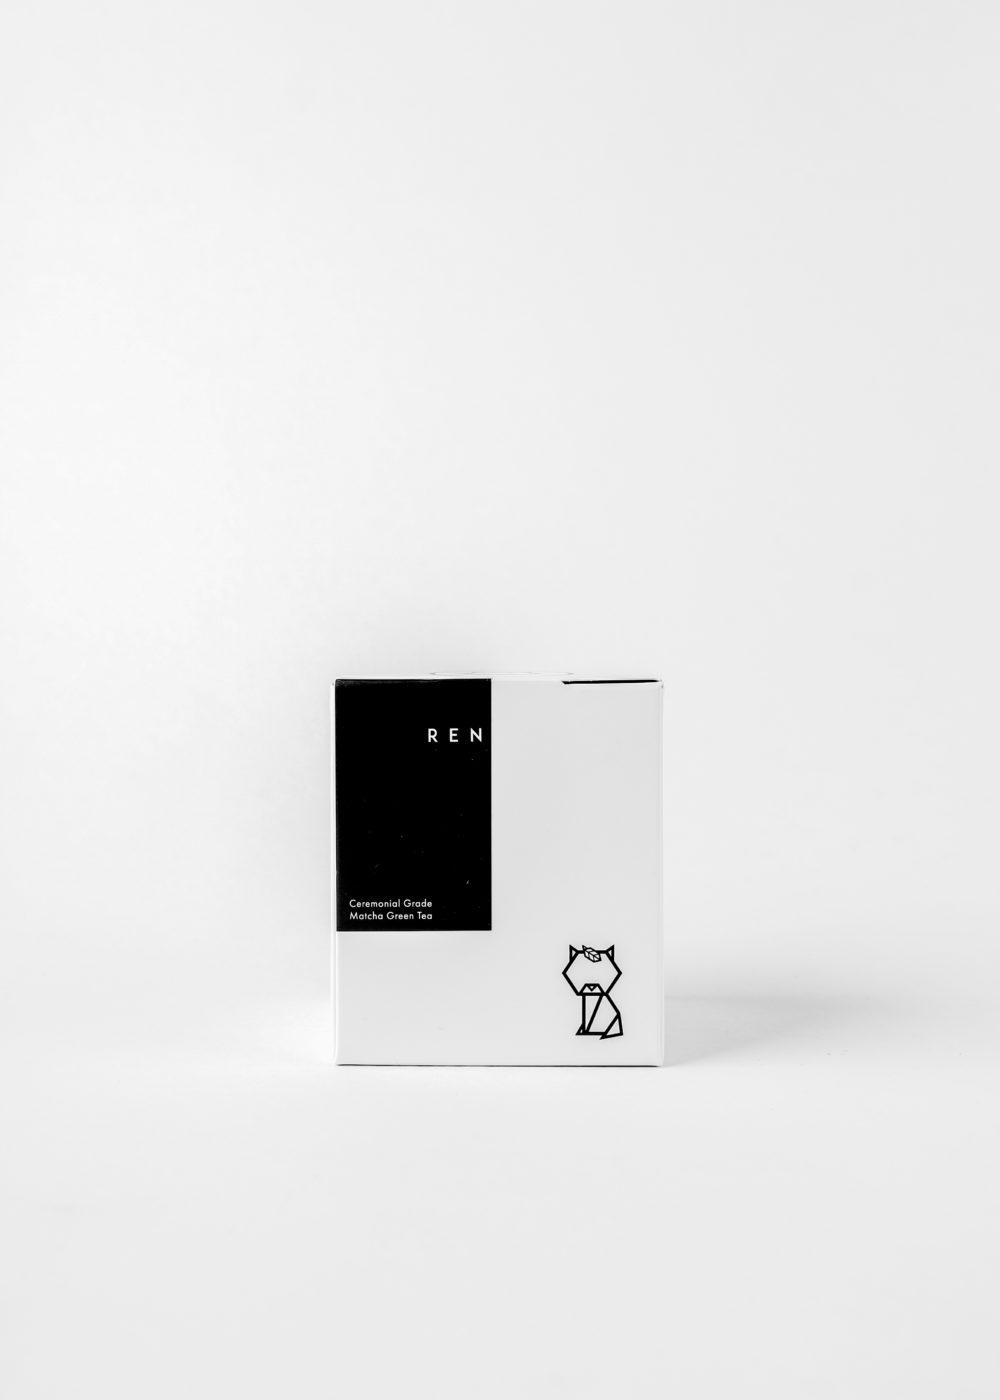 ren x powder